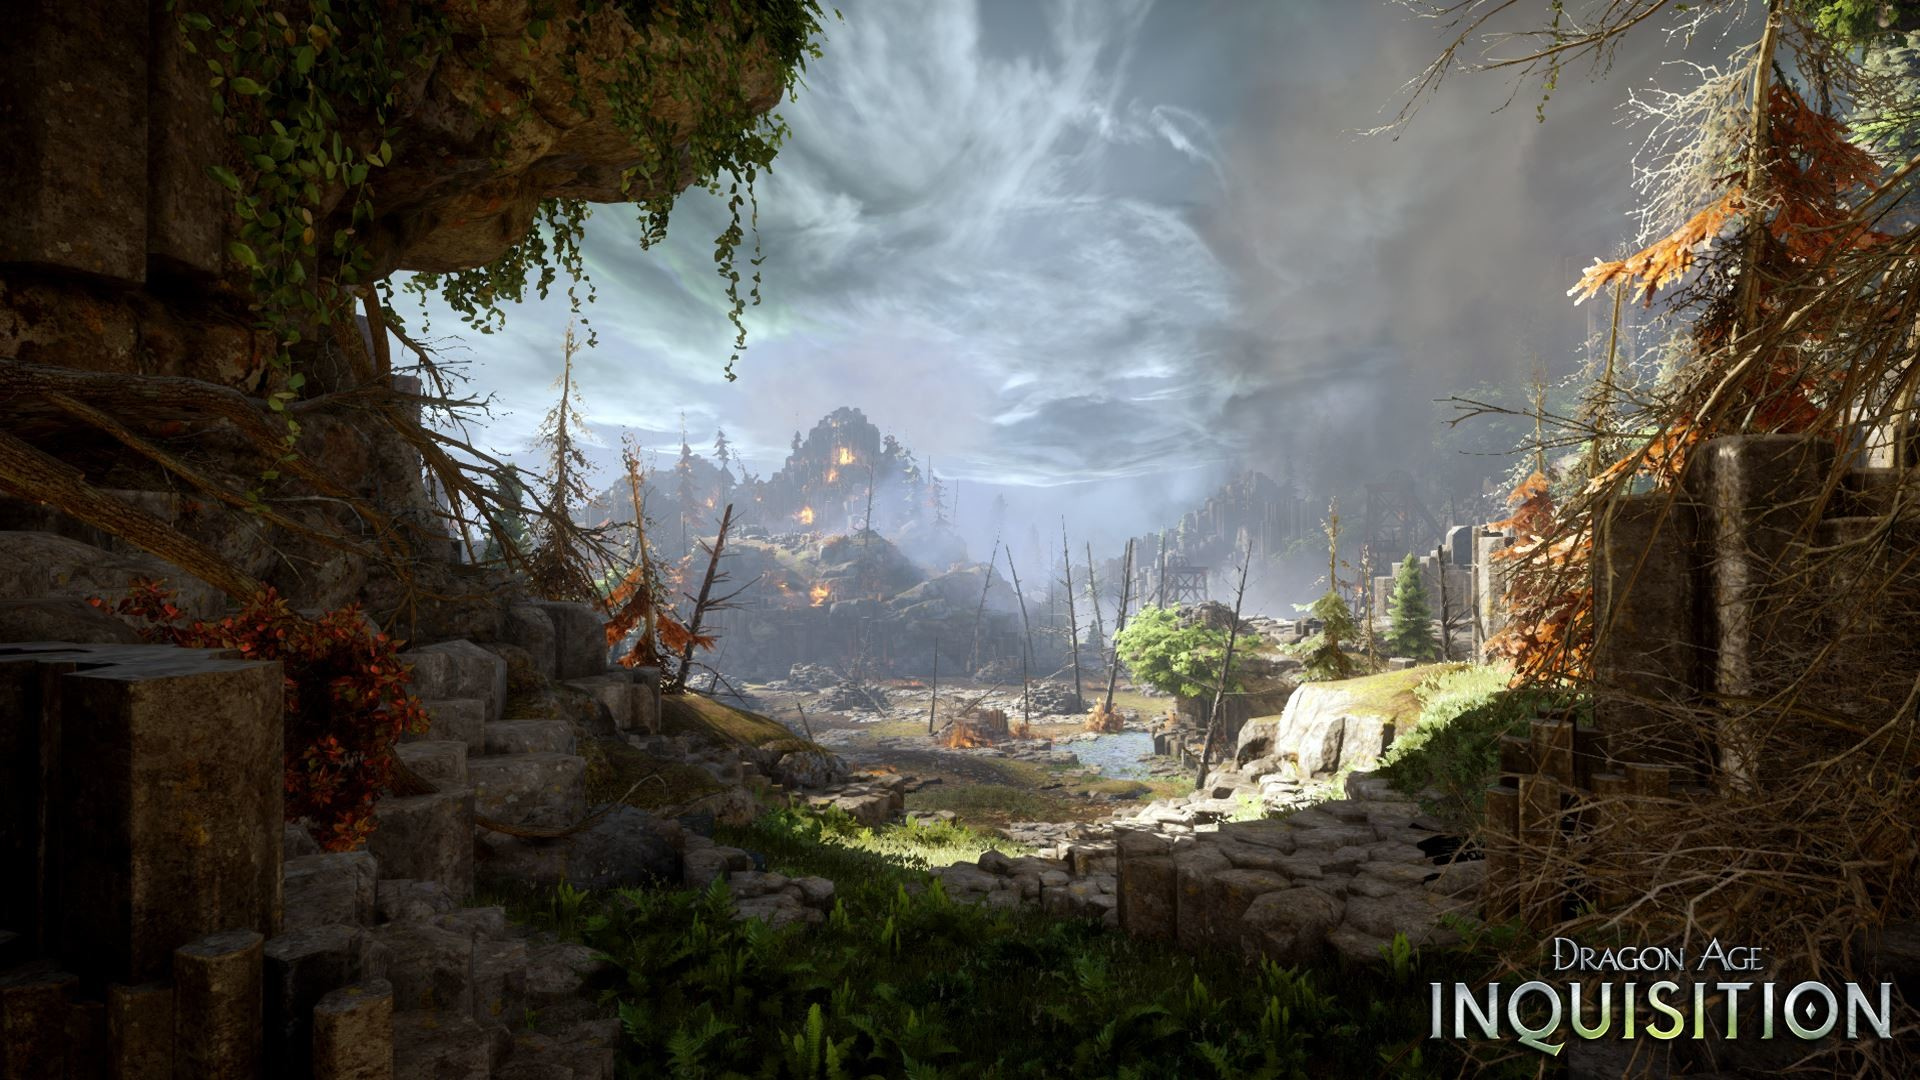 Dragon Age Inquisition Wallpaper 46383